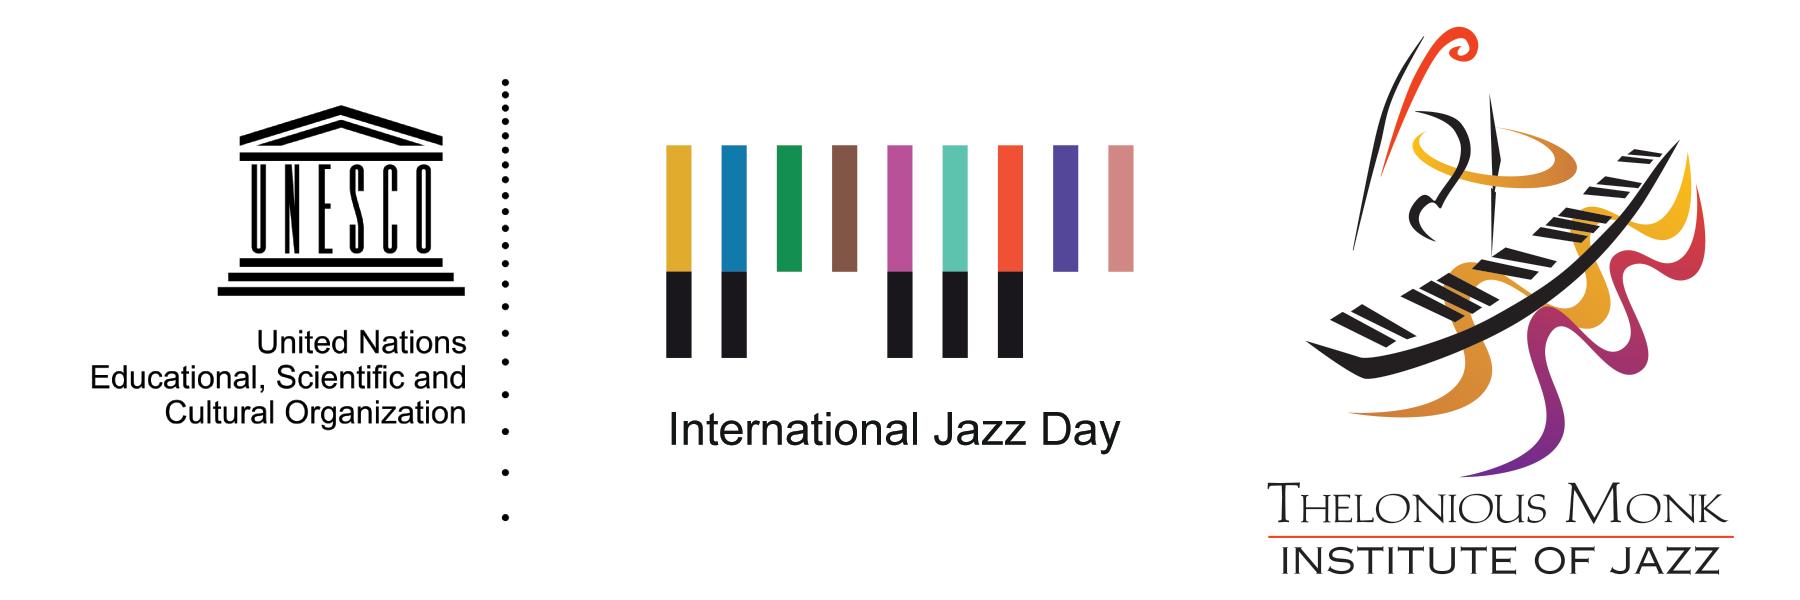 Events international jazz day buycottarizona